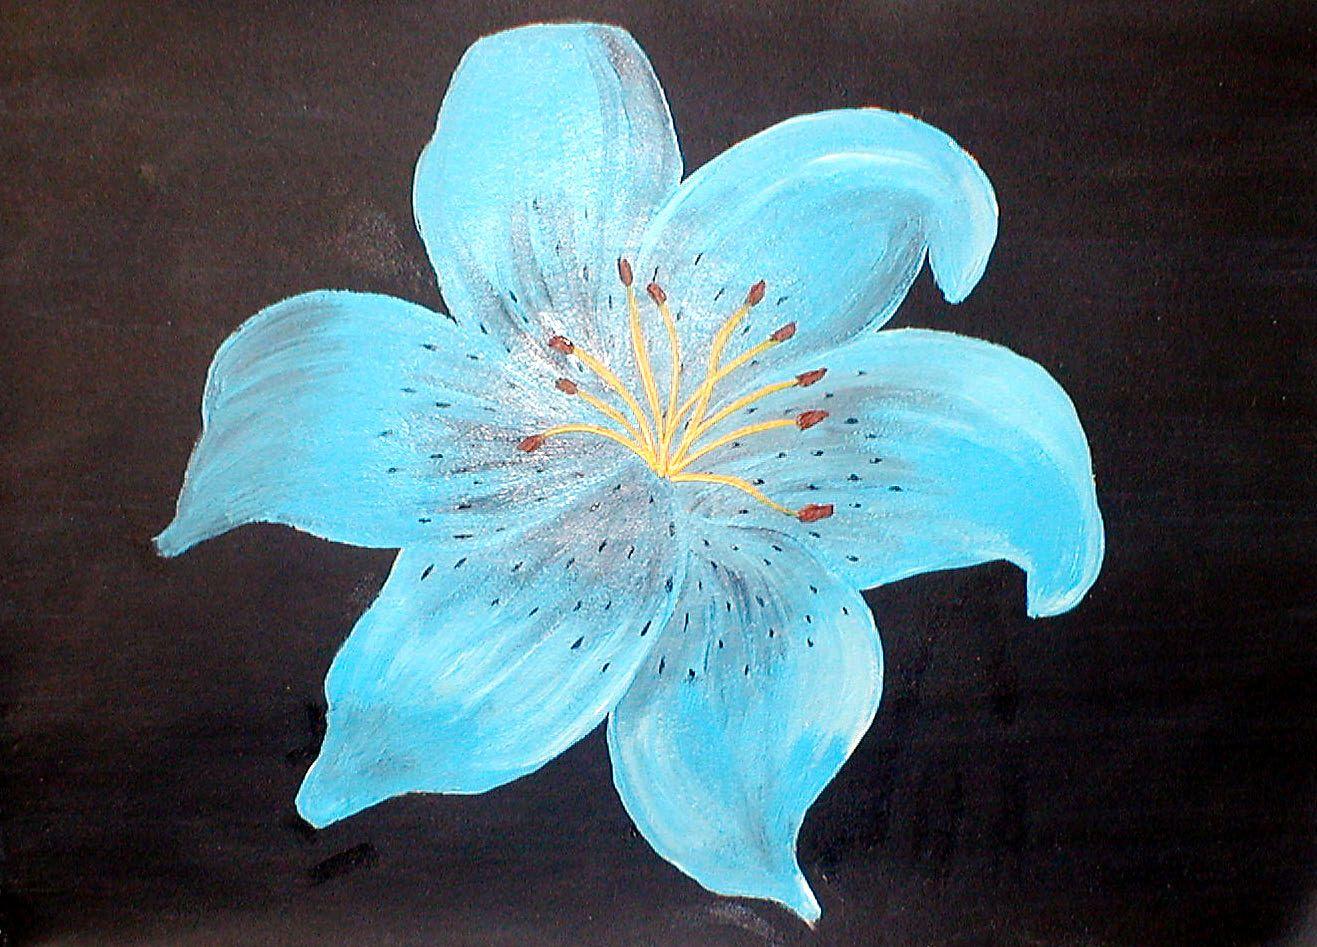 Blue tiger lily flower blue tiger lily new year 2014 pinterest blue tiger lily flower blue tiger lily izmirmasajfo